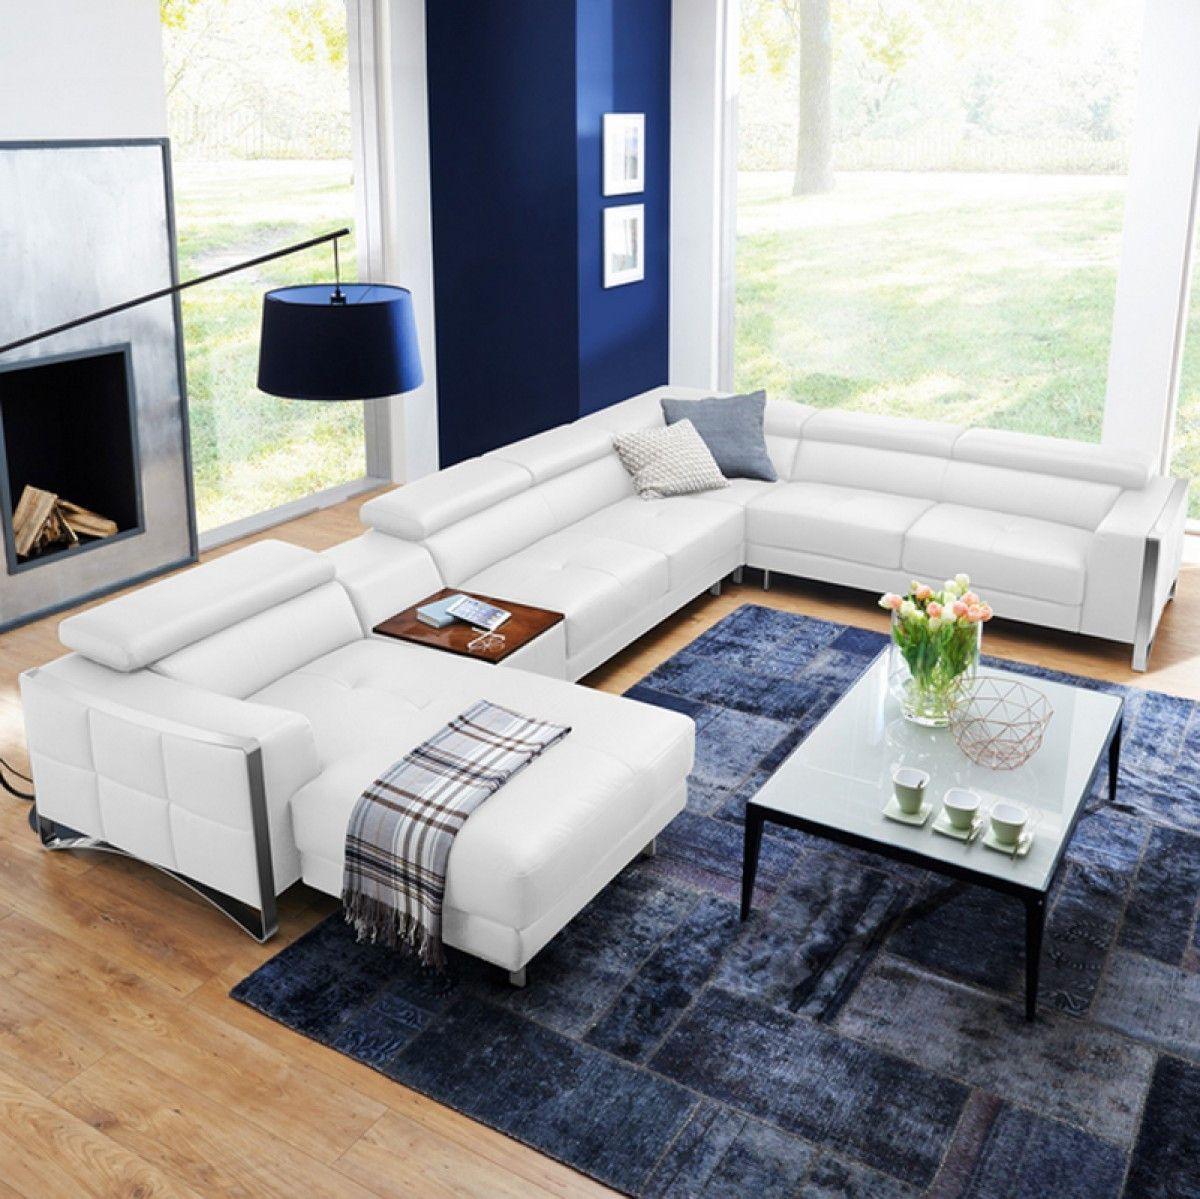 Divani Casa Arles Modern White Leather Sectional Sofa VGCS1504C-LAF ...